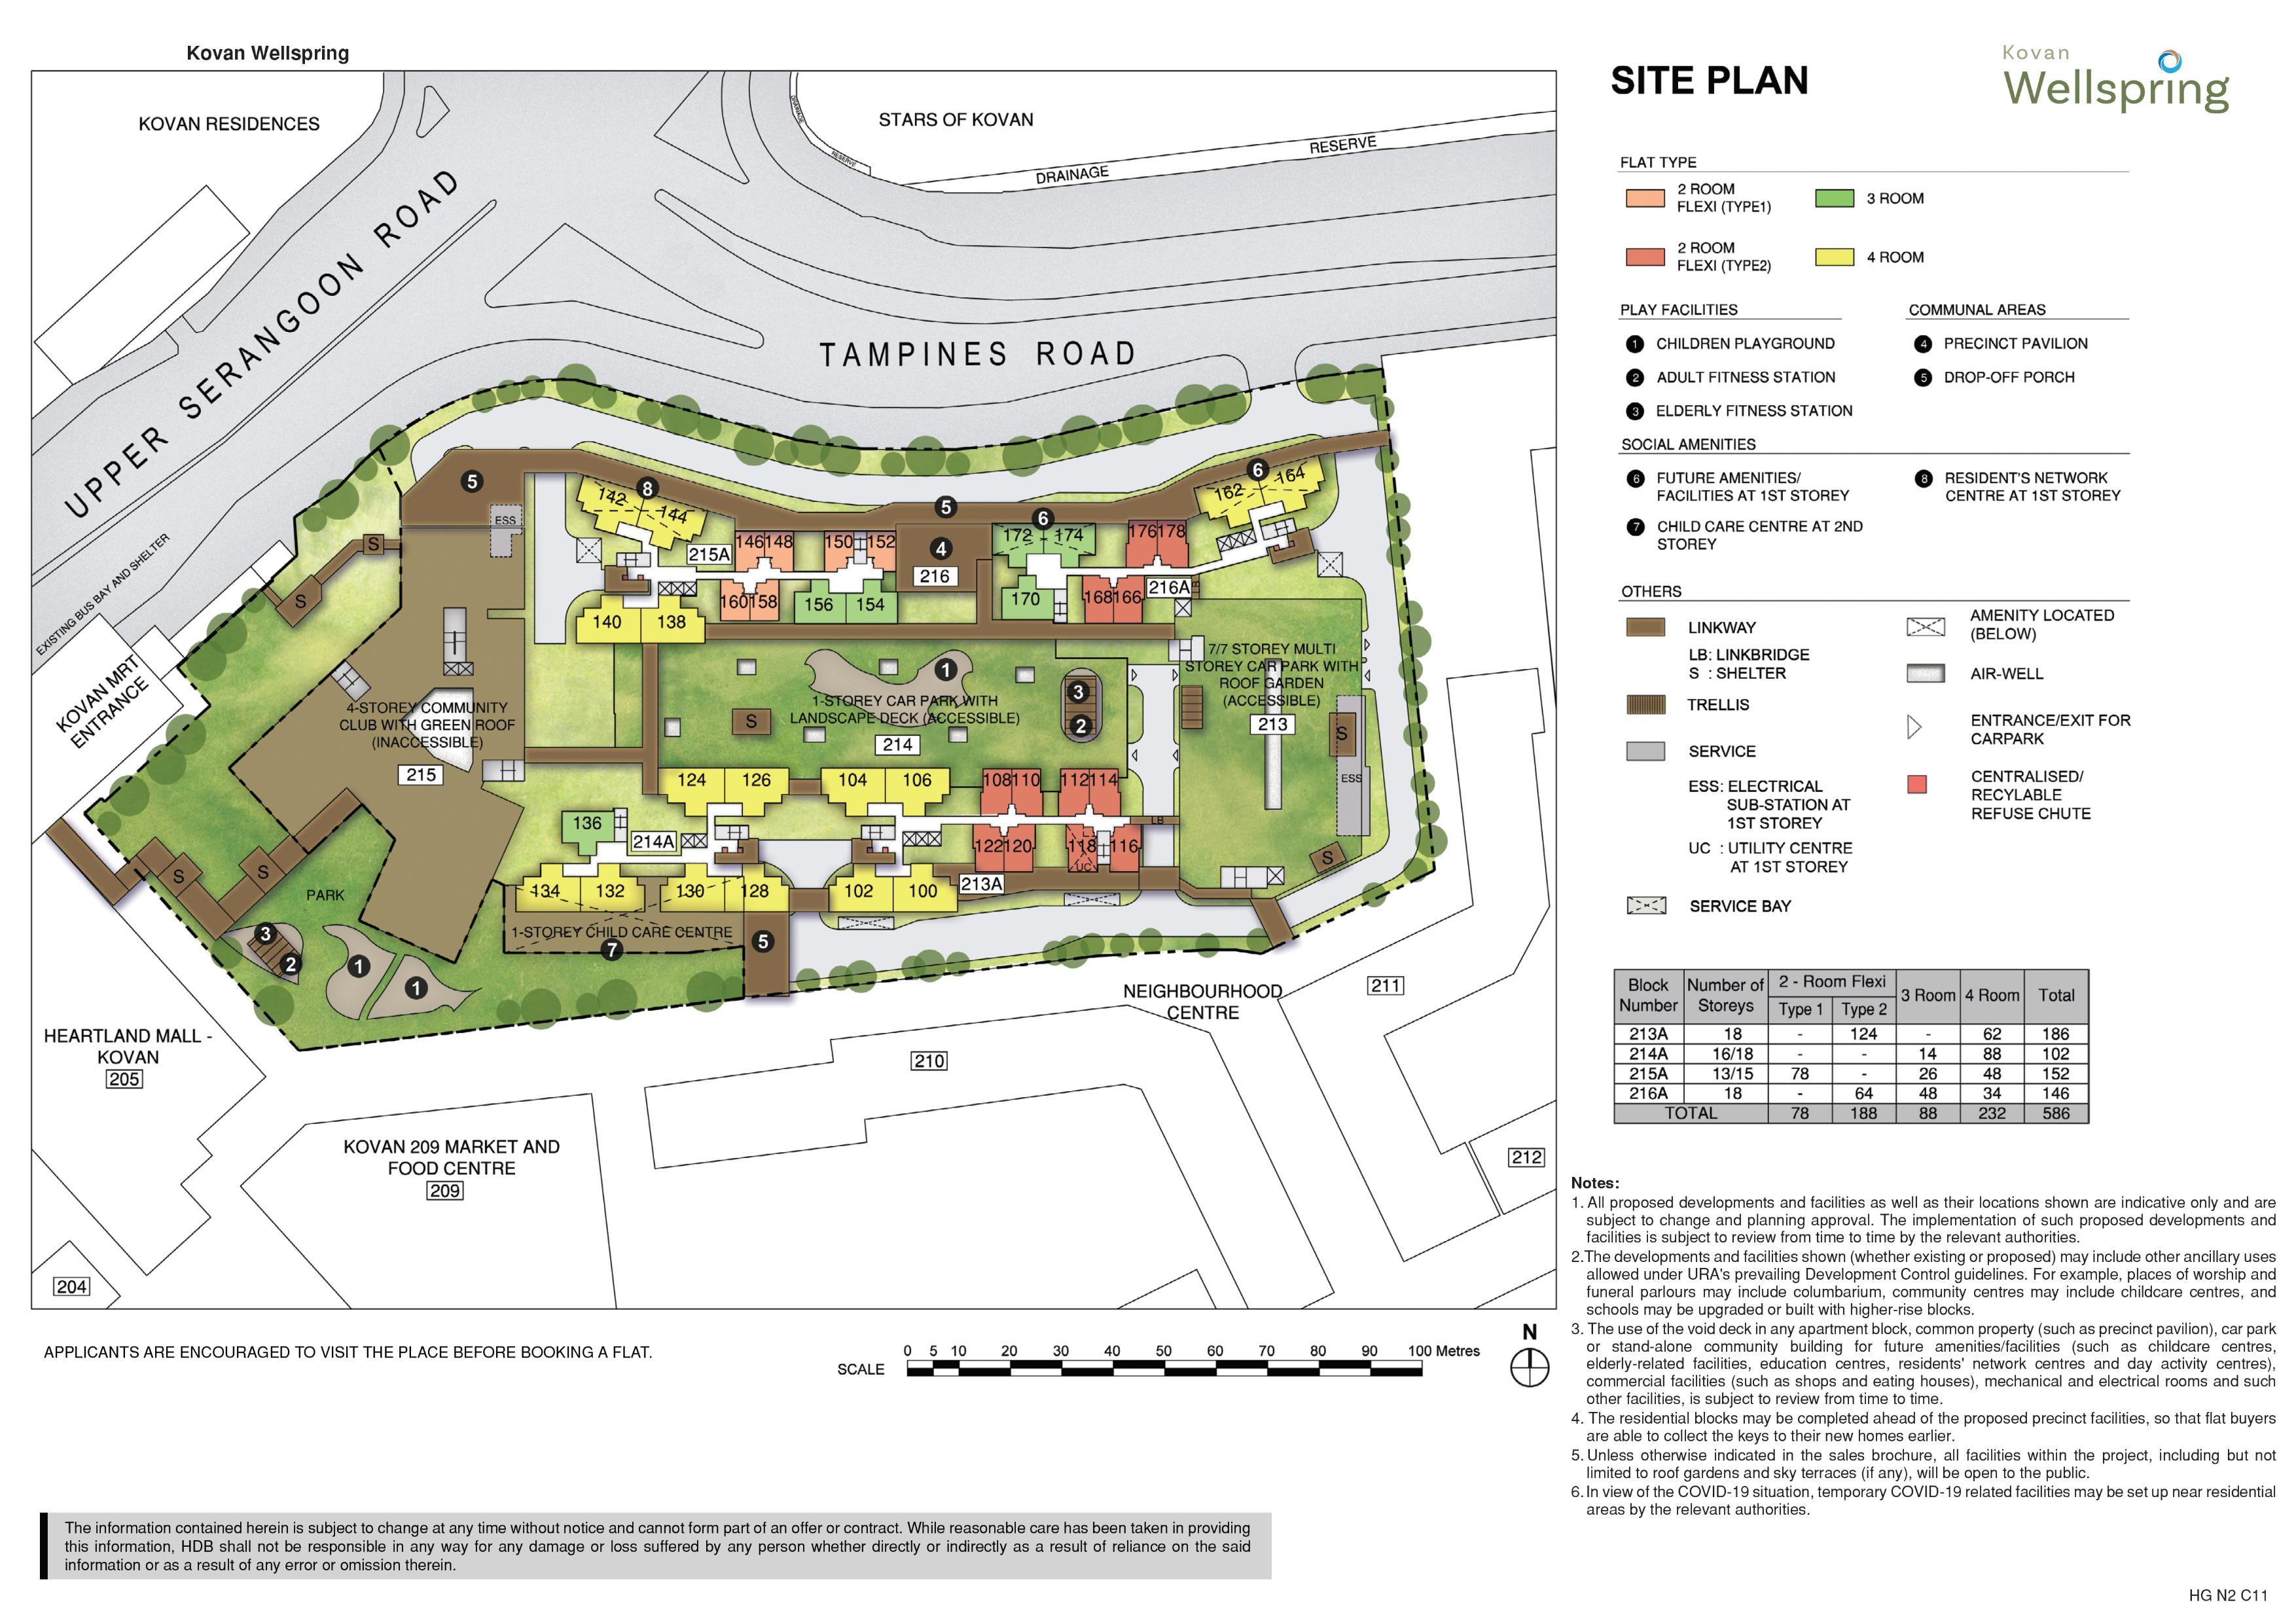 Kovan Wellspring Site Plan